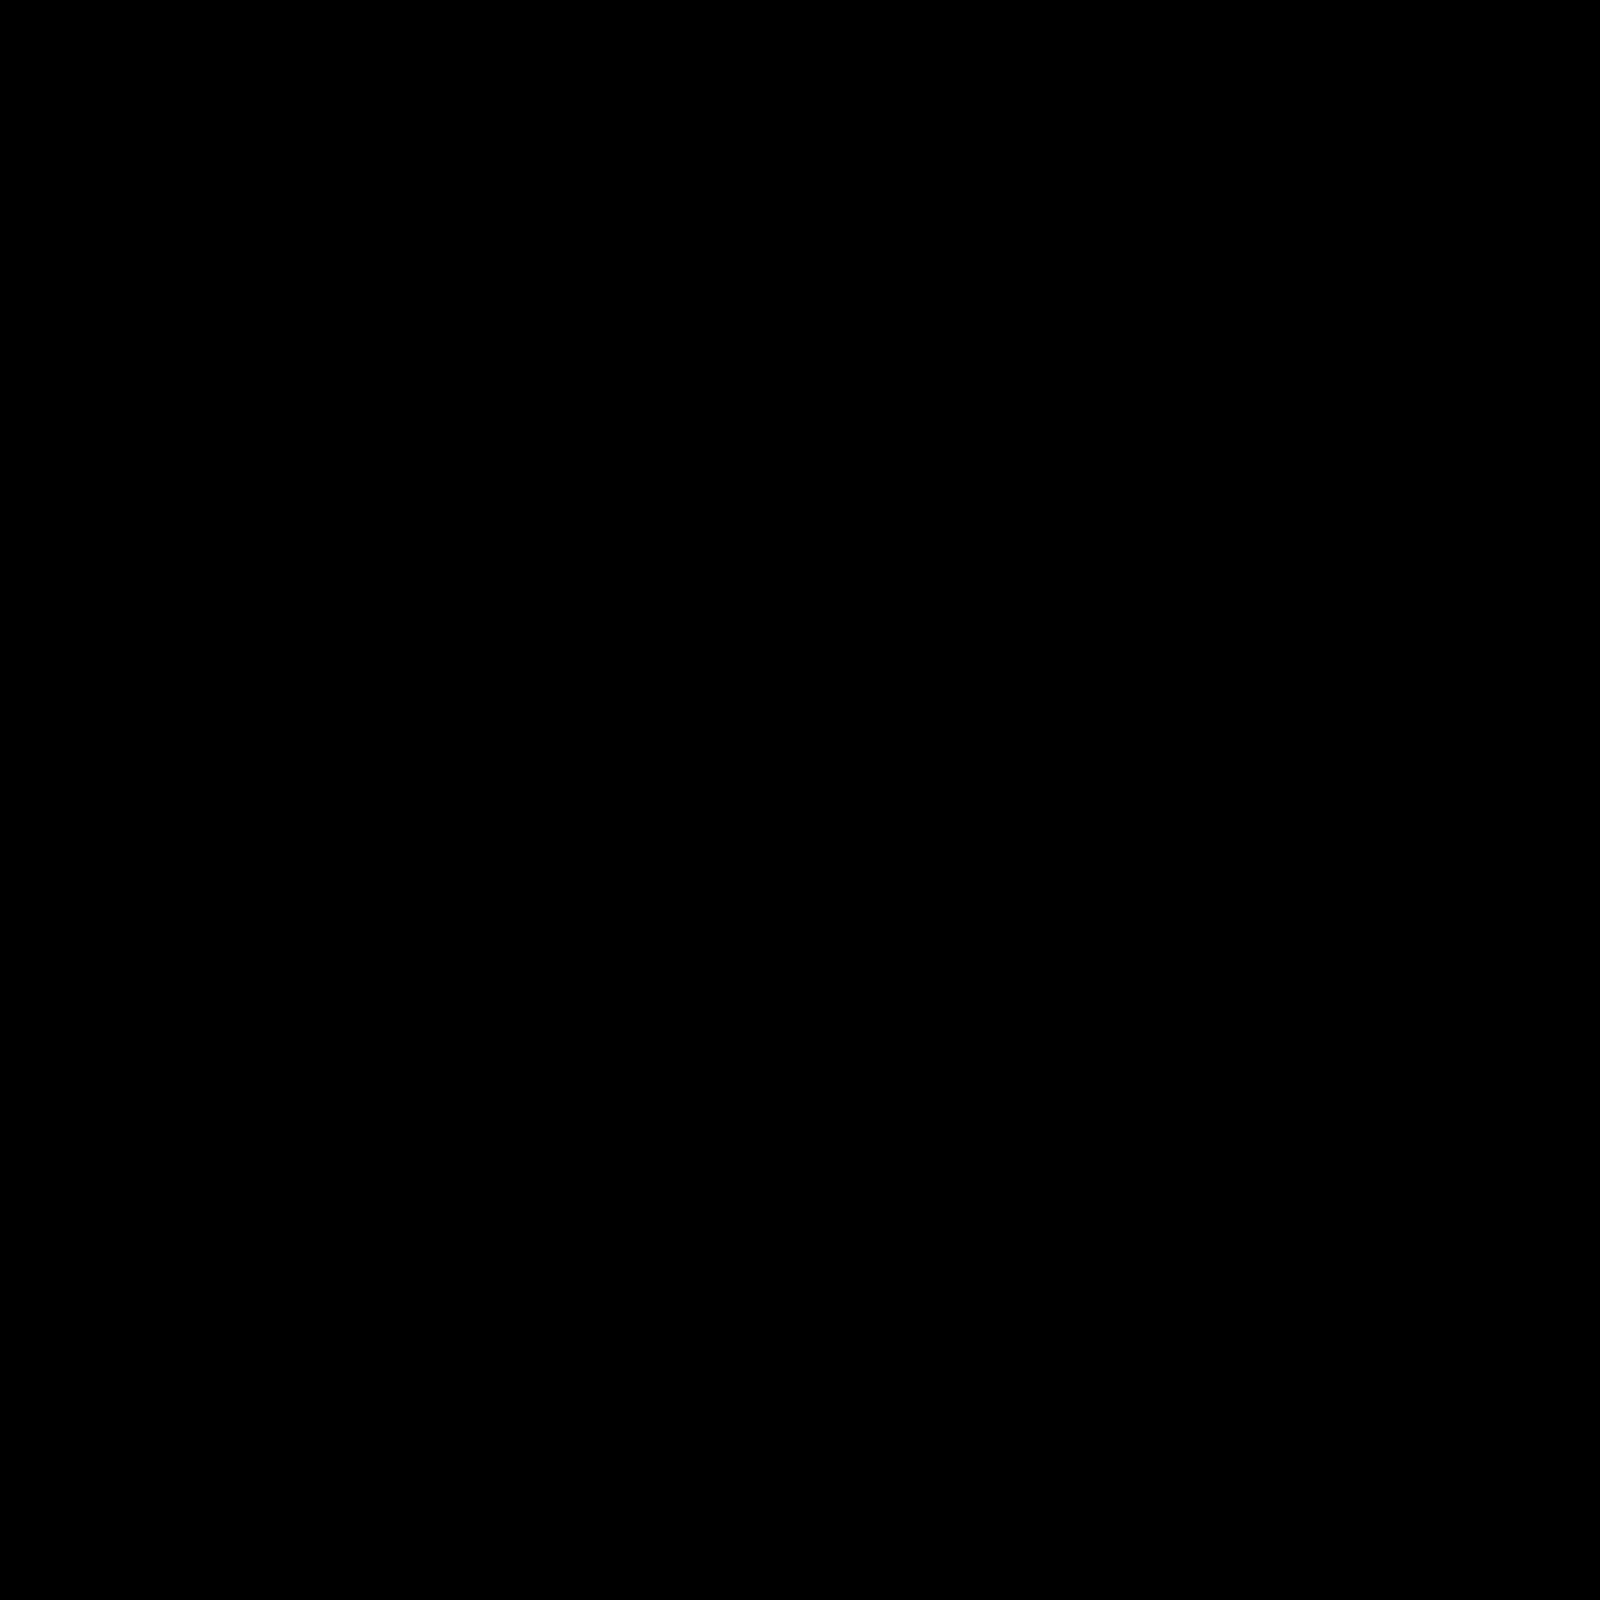 Circled S icon